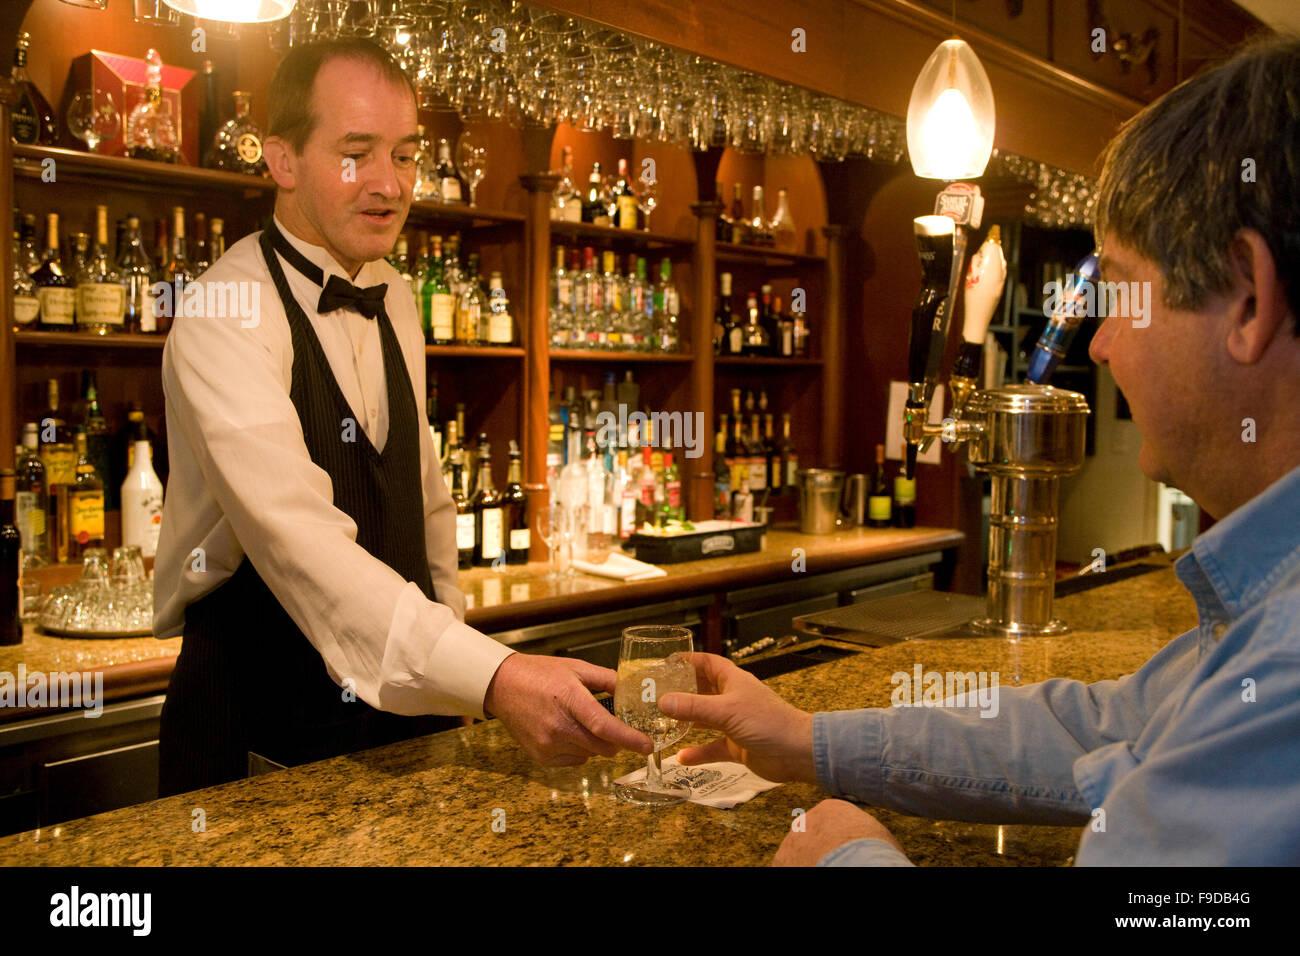 Barman serving drinks - Stock Image